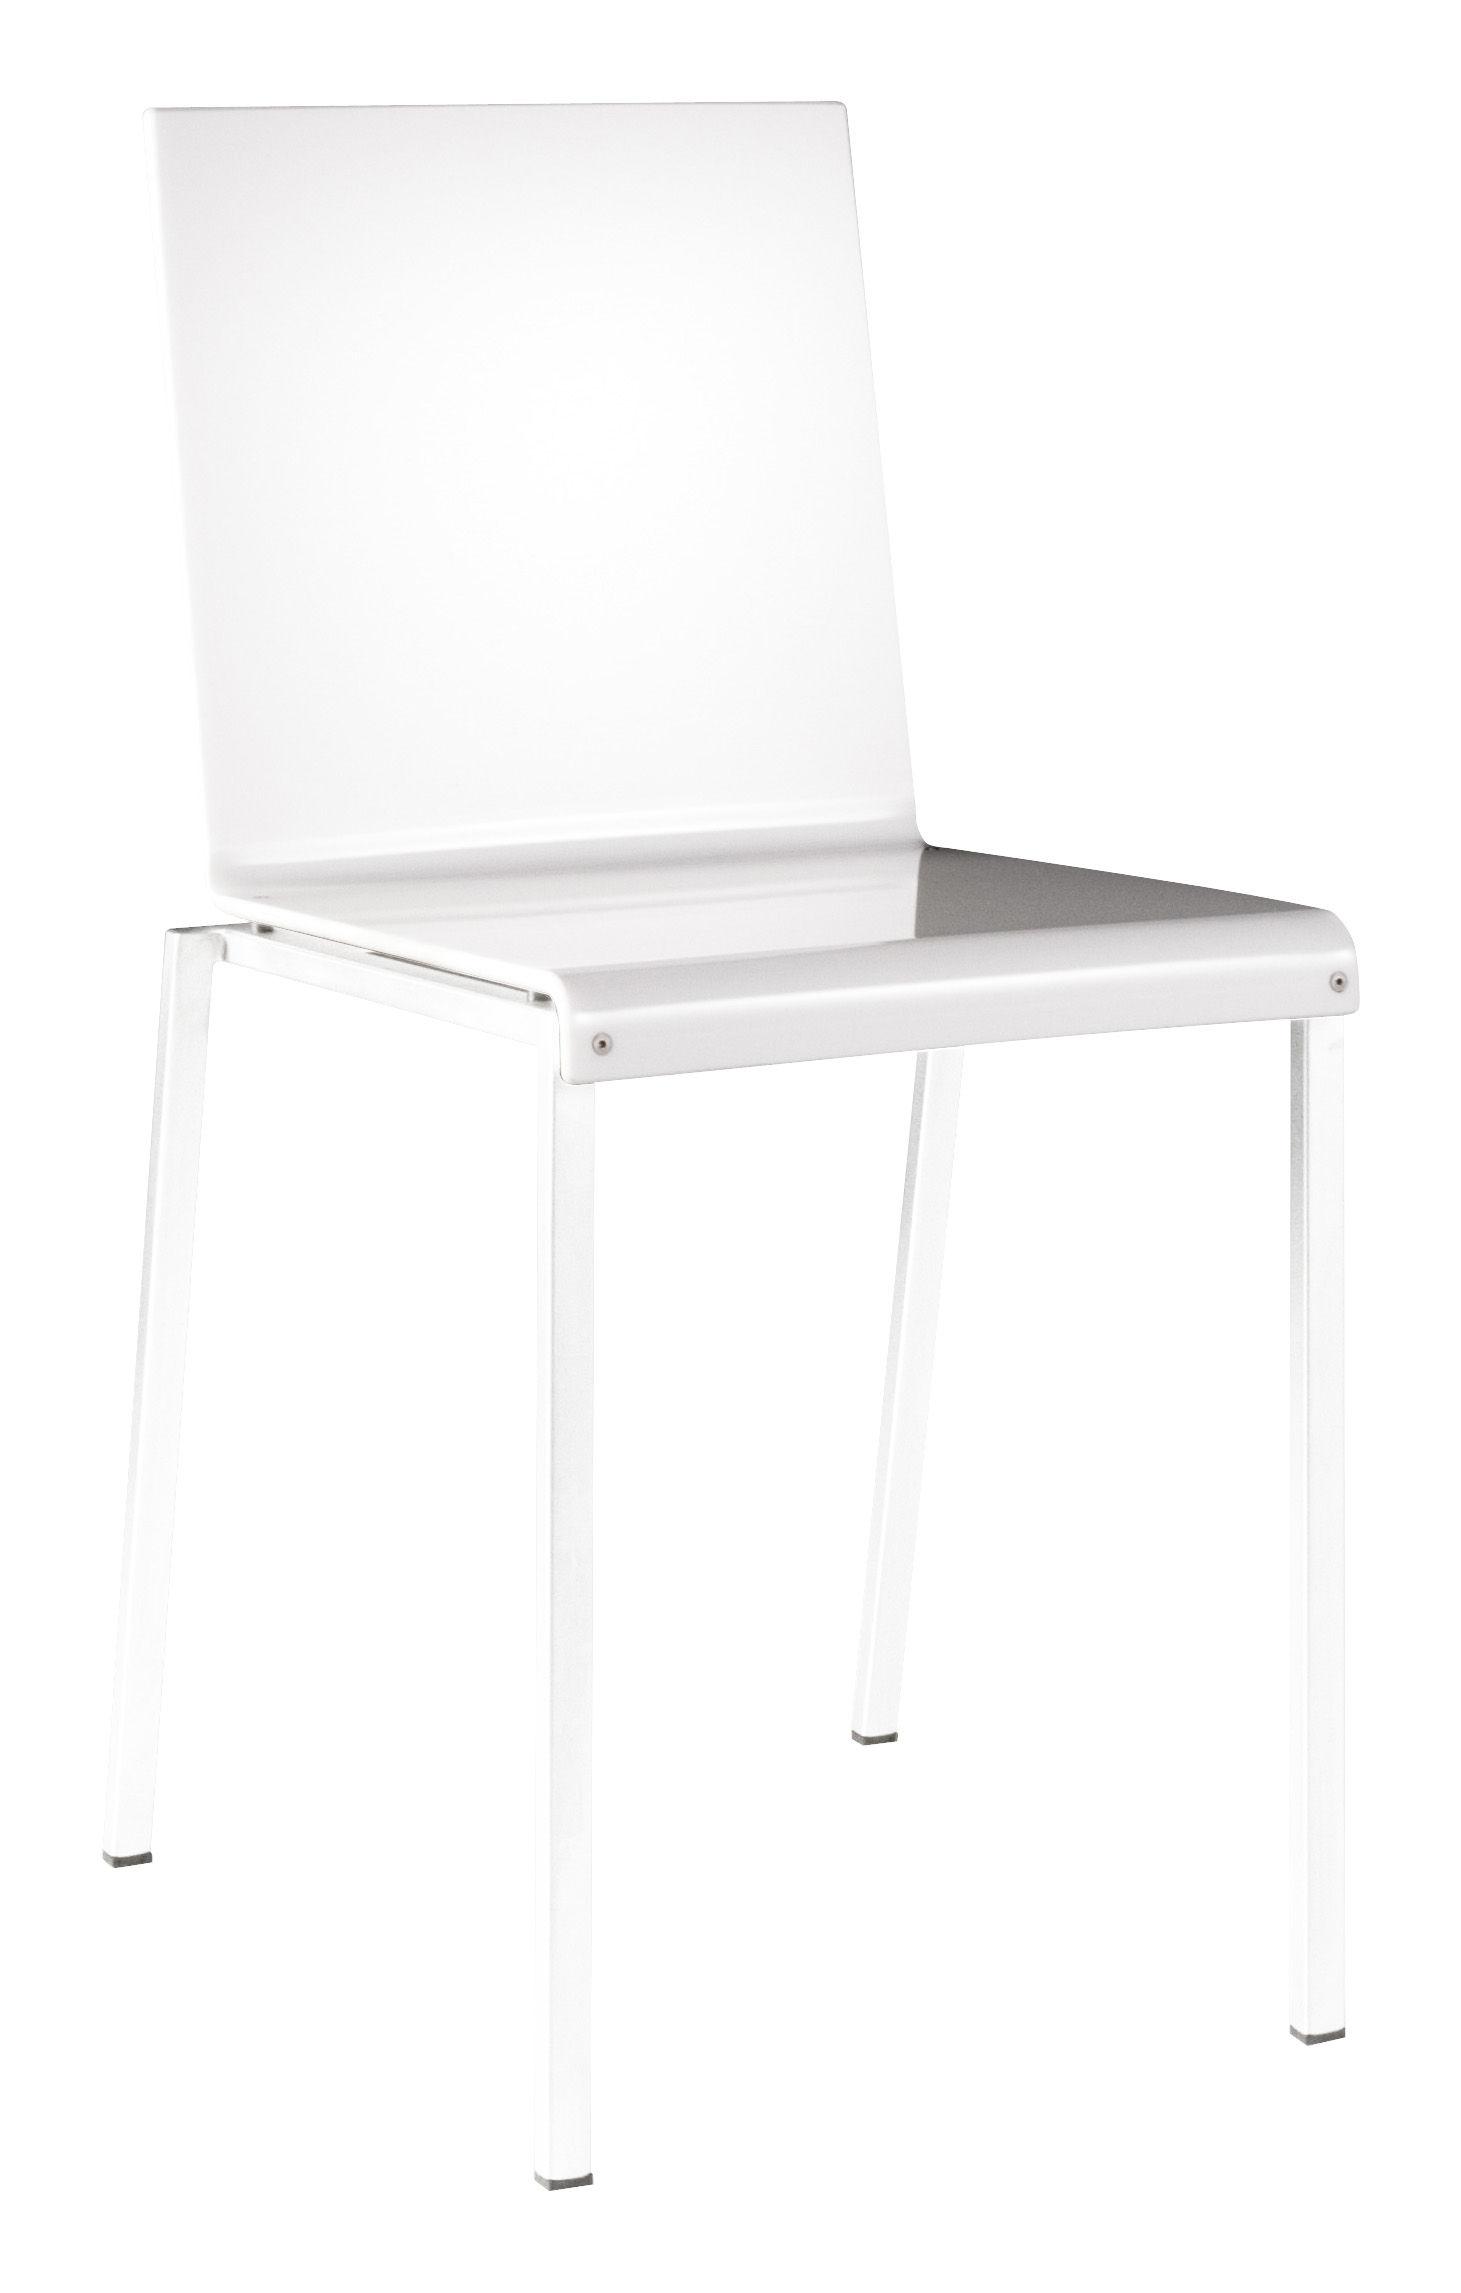 Möbel - Stühle  - Bianca Stuhl - Farbe glänzend - monochrom - Zeus - Sitz weiß glänzend - Stuhlbeine weiß - Acrylharz, Stahl